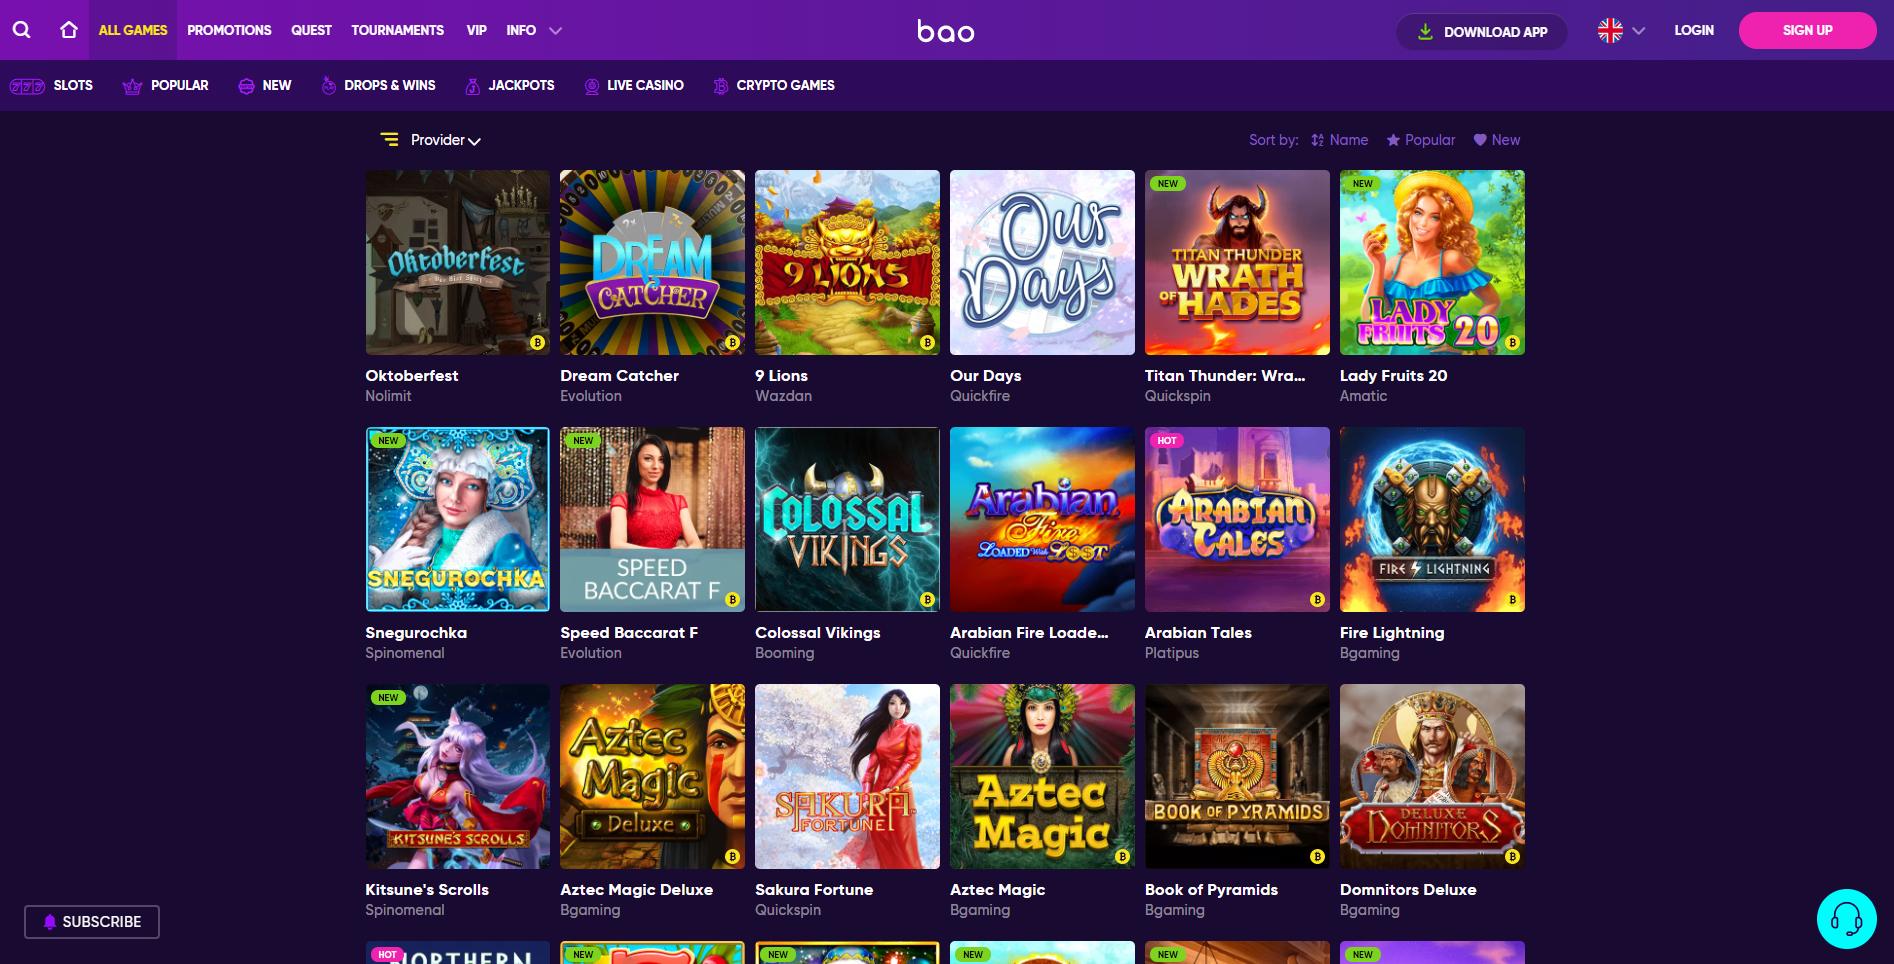 BAO Casino Bonus Codes 2021